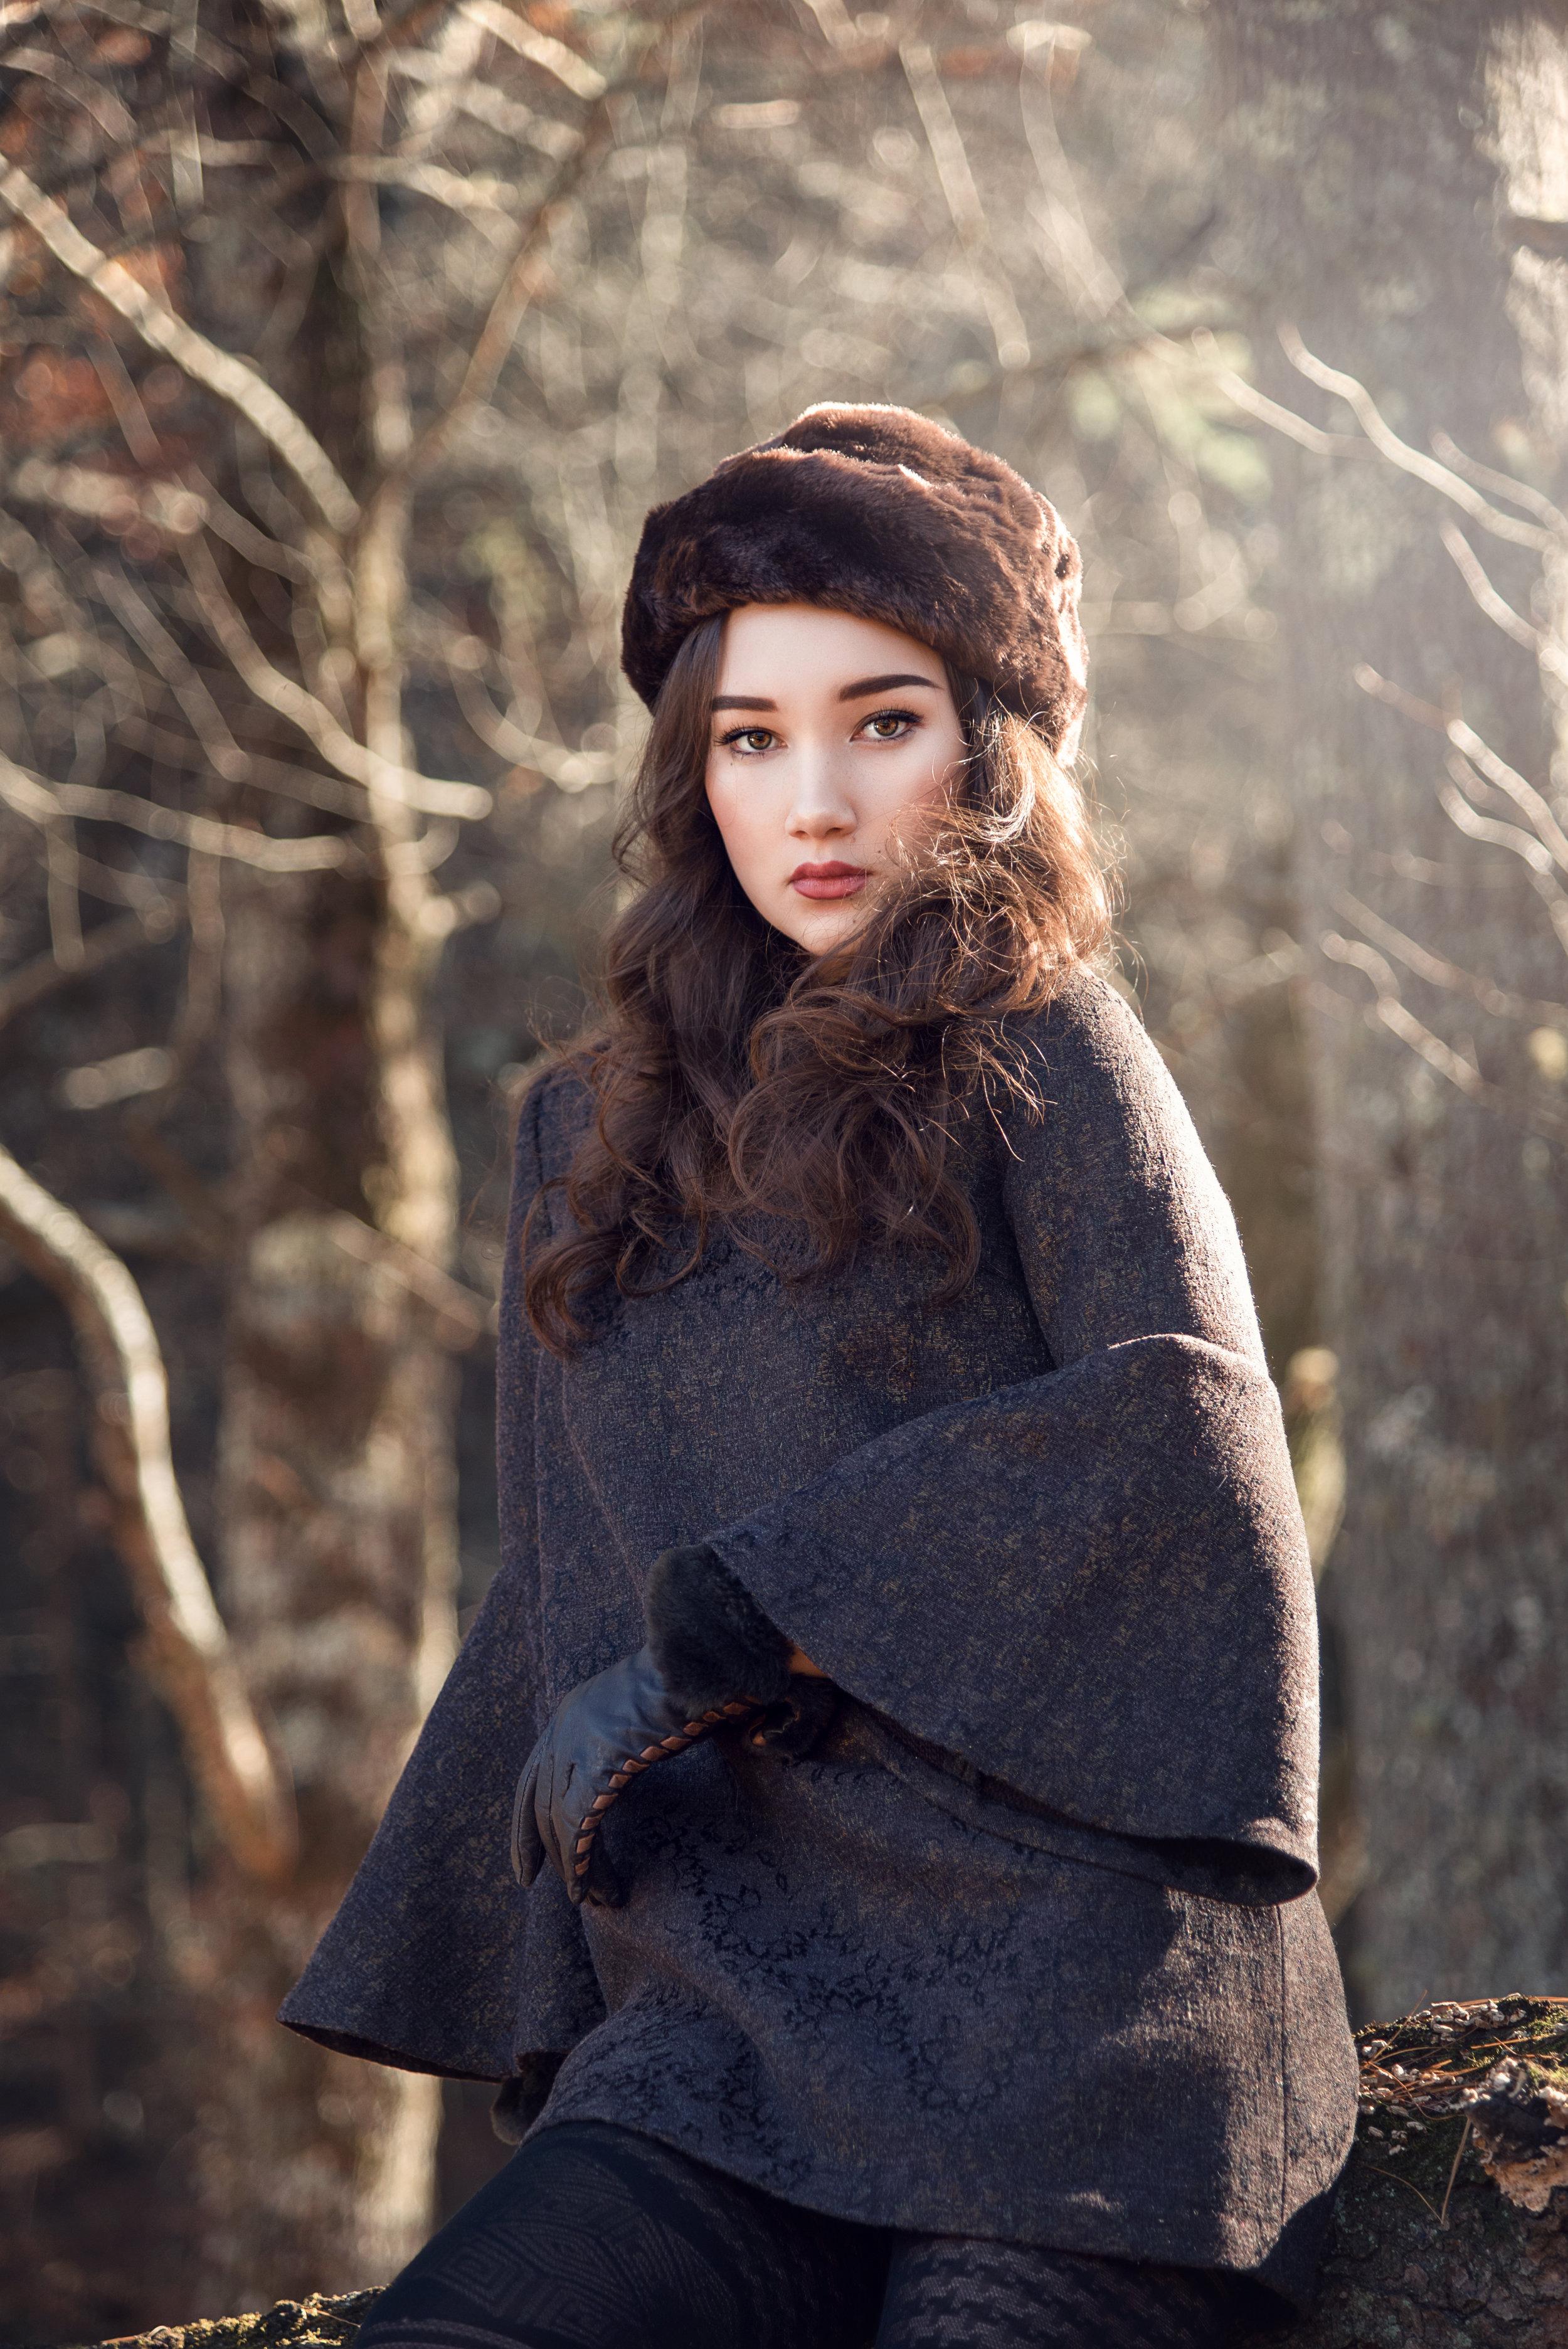 AK Holiday '17 - Angela Kim Designs-Asheville, N.C. (Model-Aislin Freya Pax)